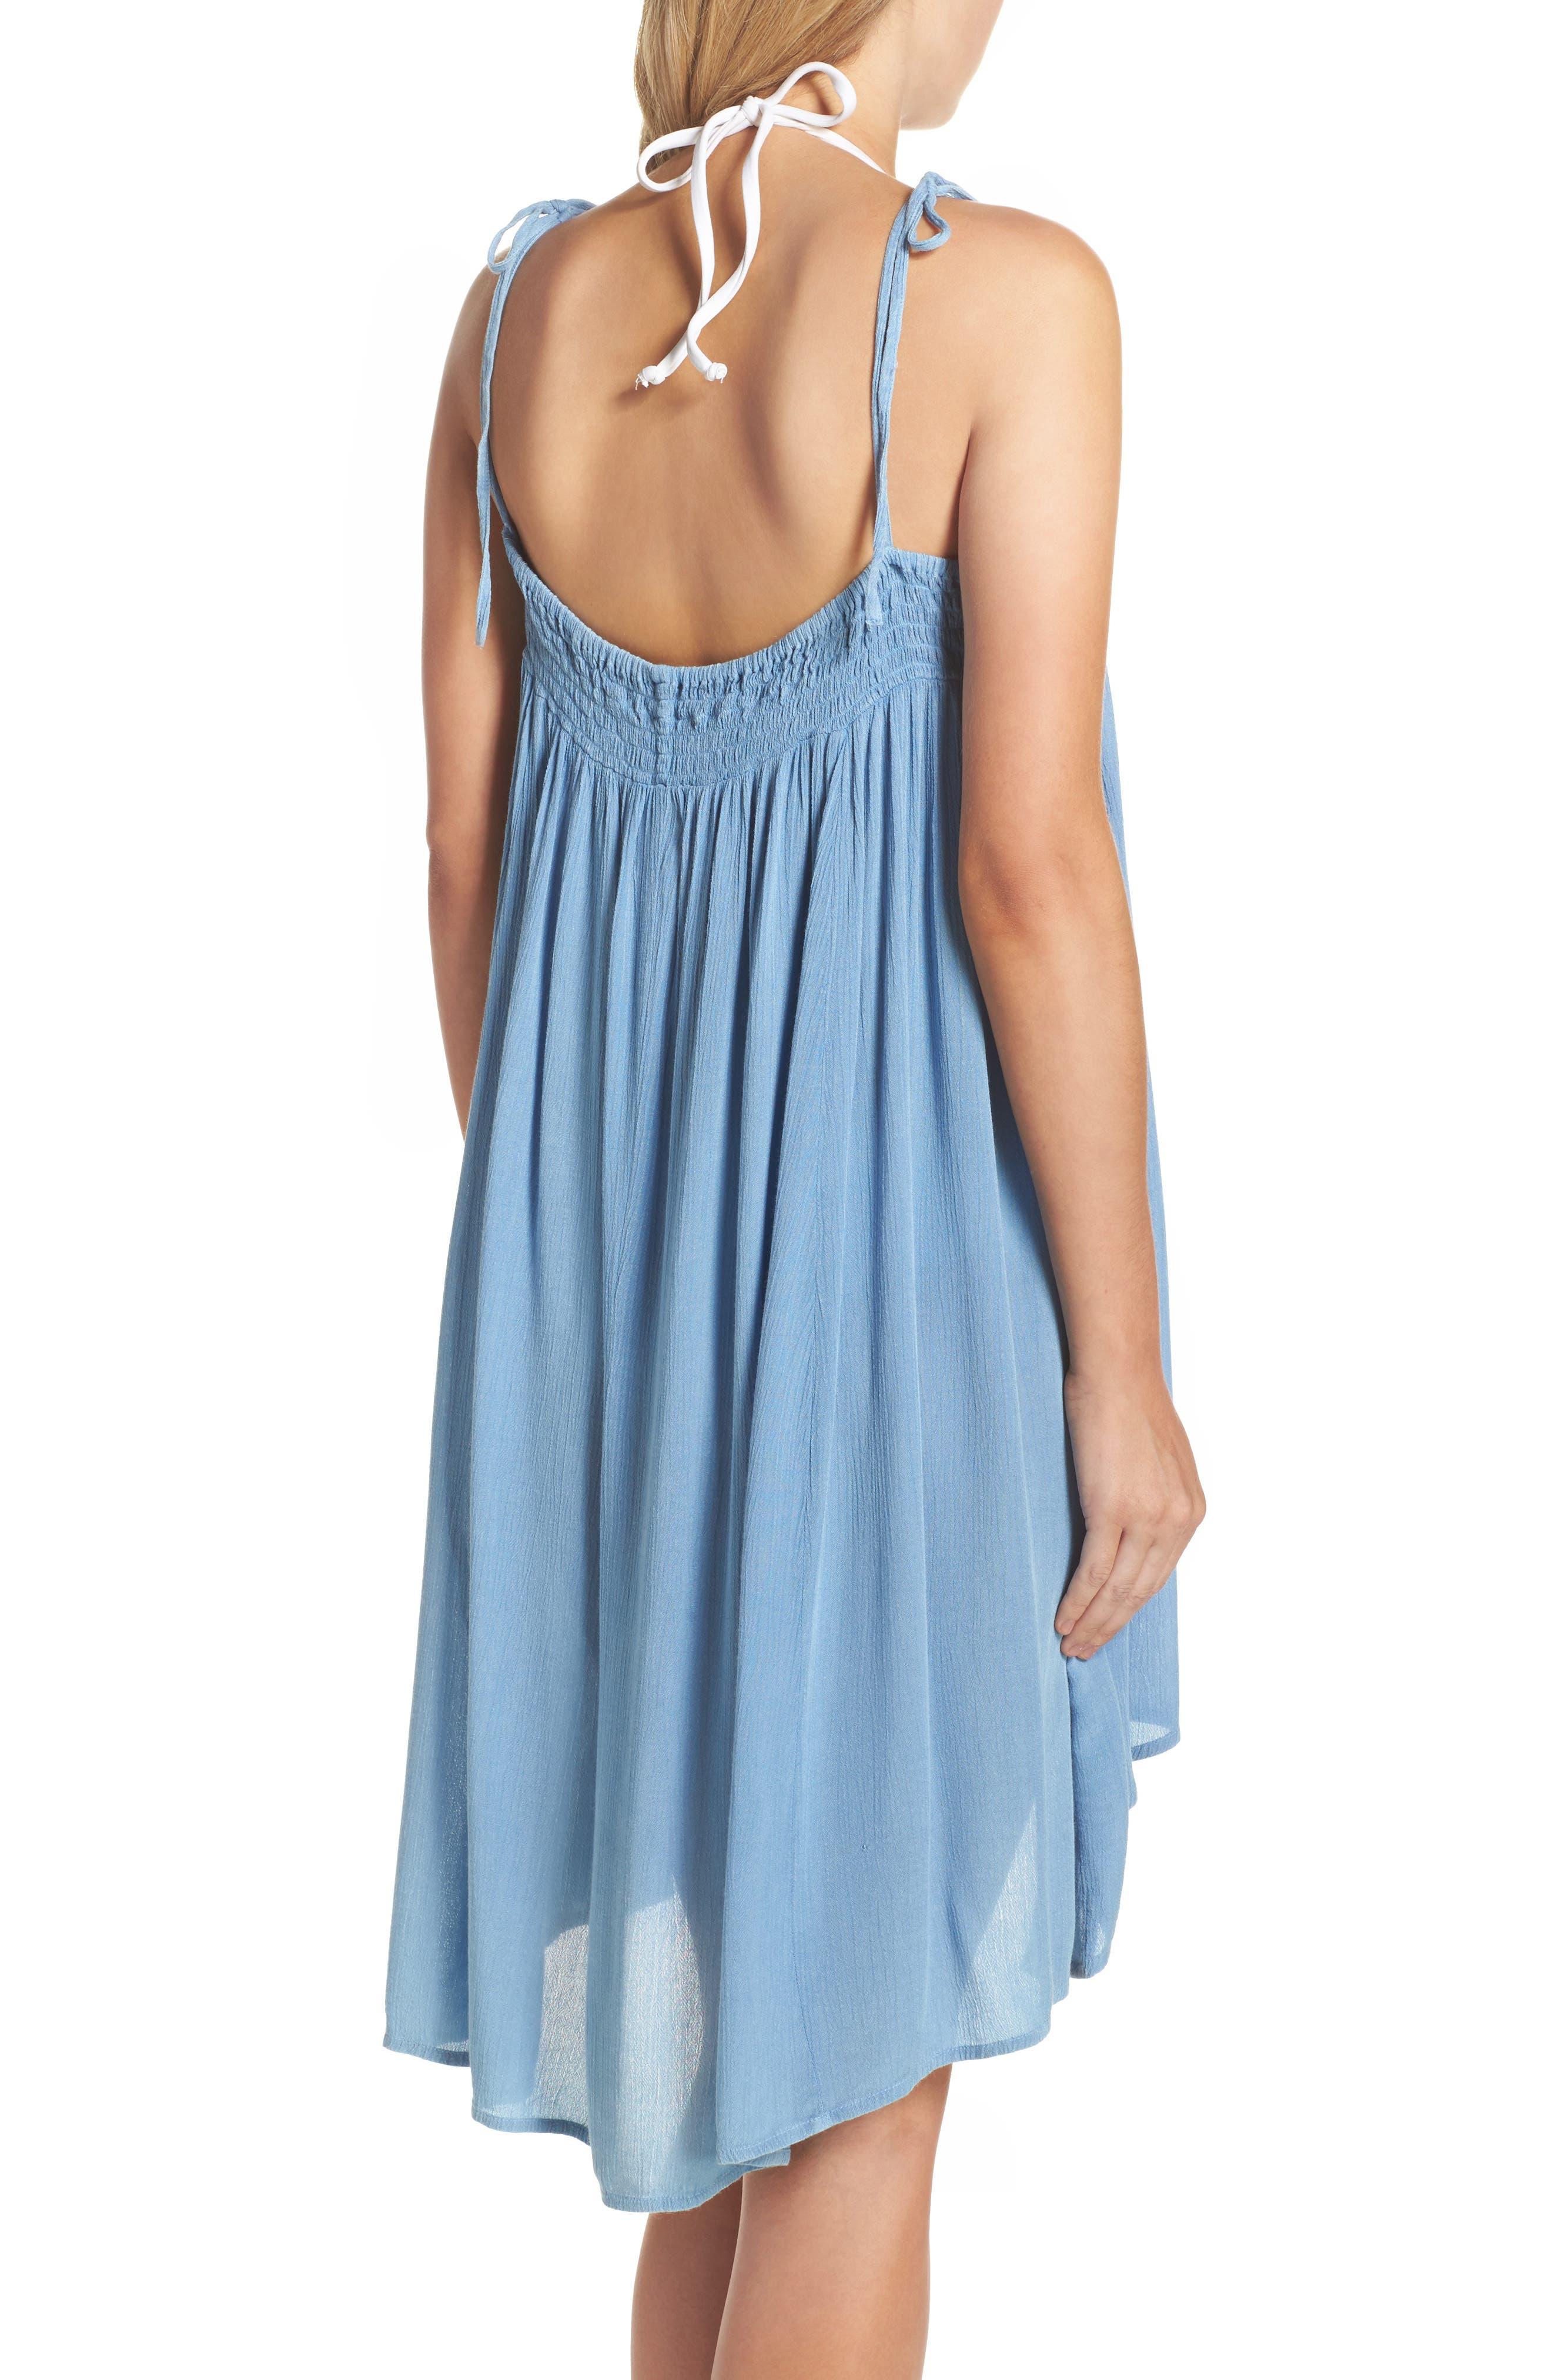 Oliva Cover-Up Dress,                             Alternate thumbnail 2, color,                             462